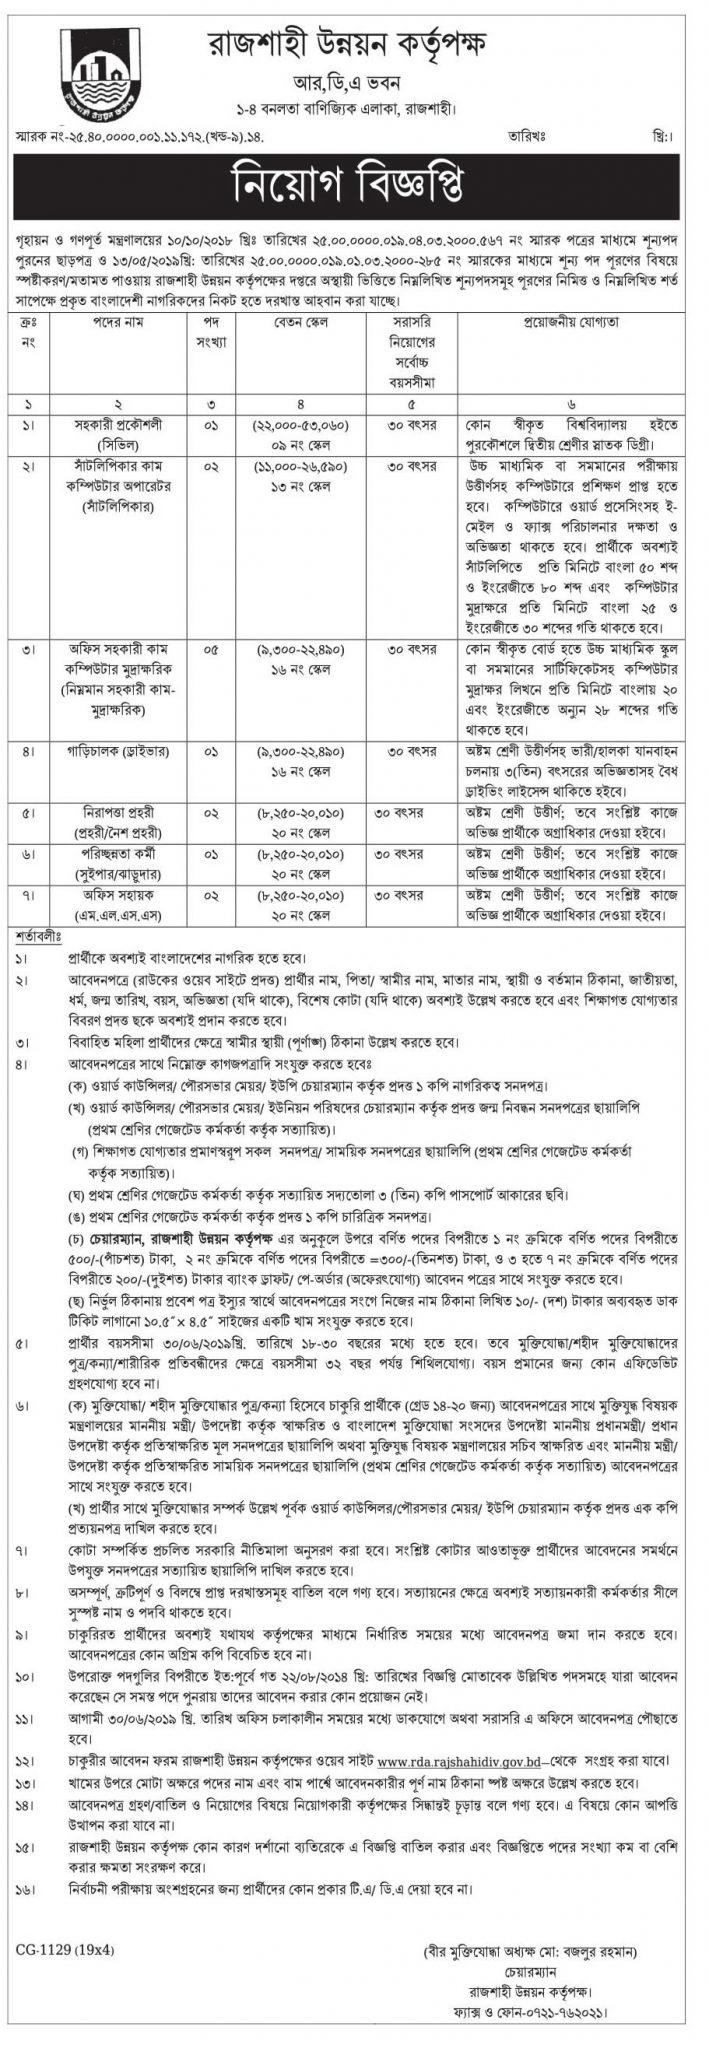 Rural Development Academy RDA Job Circular 2019